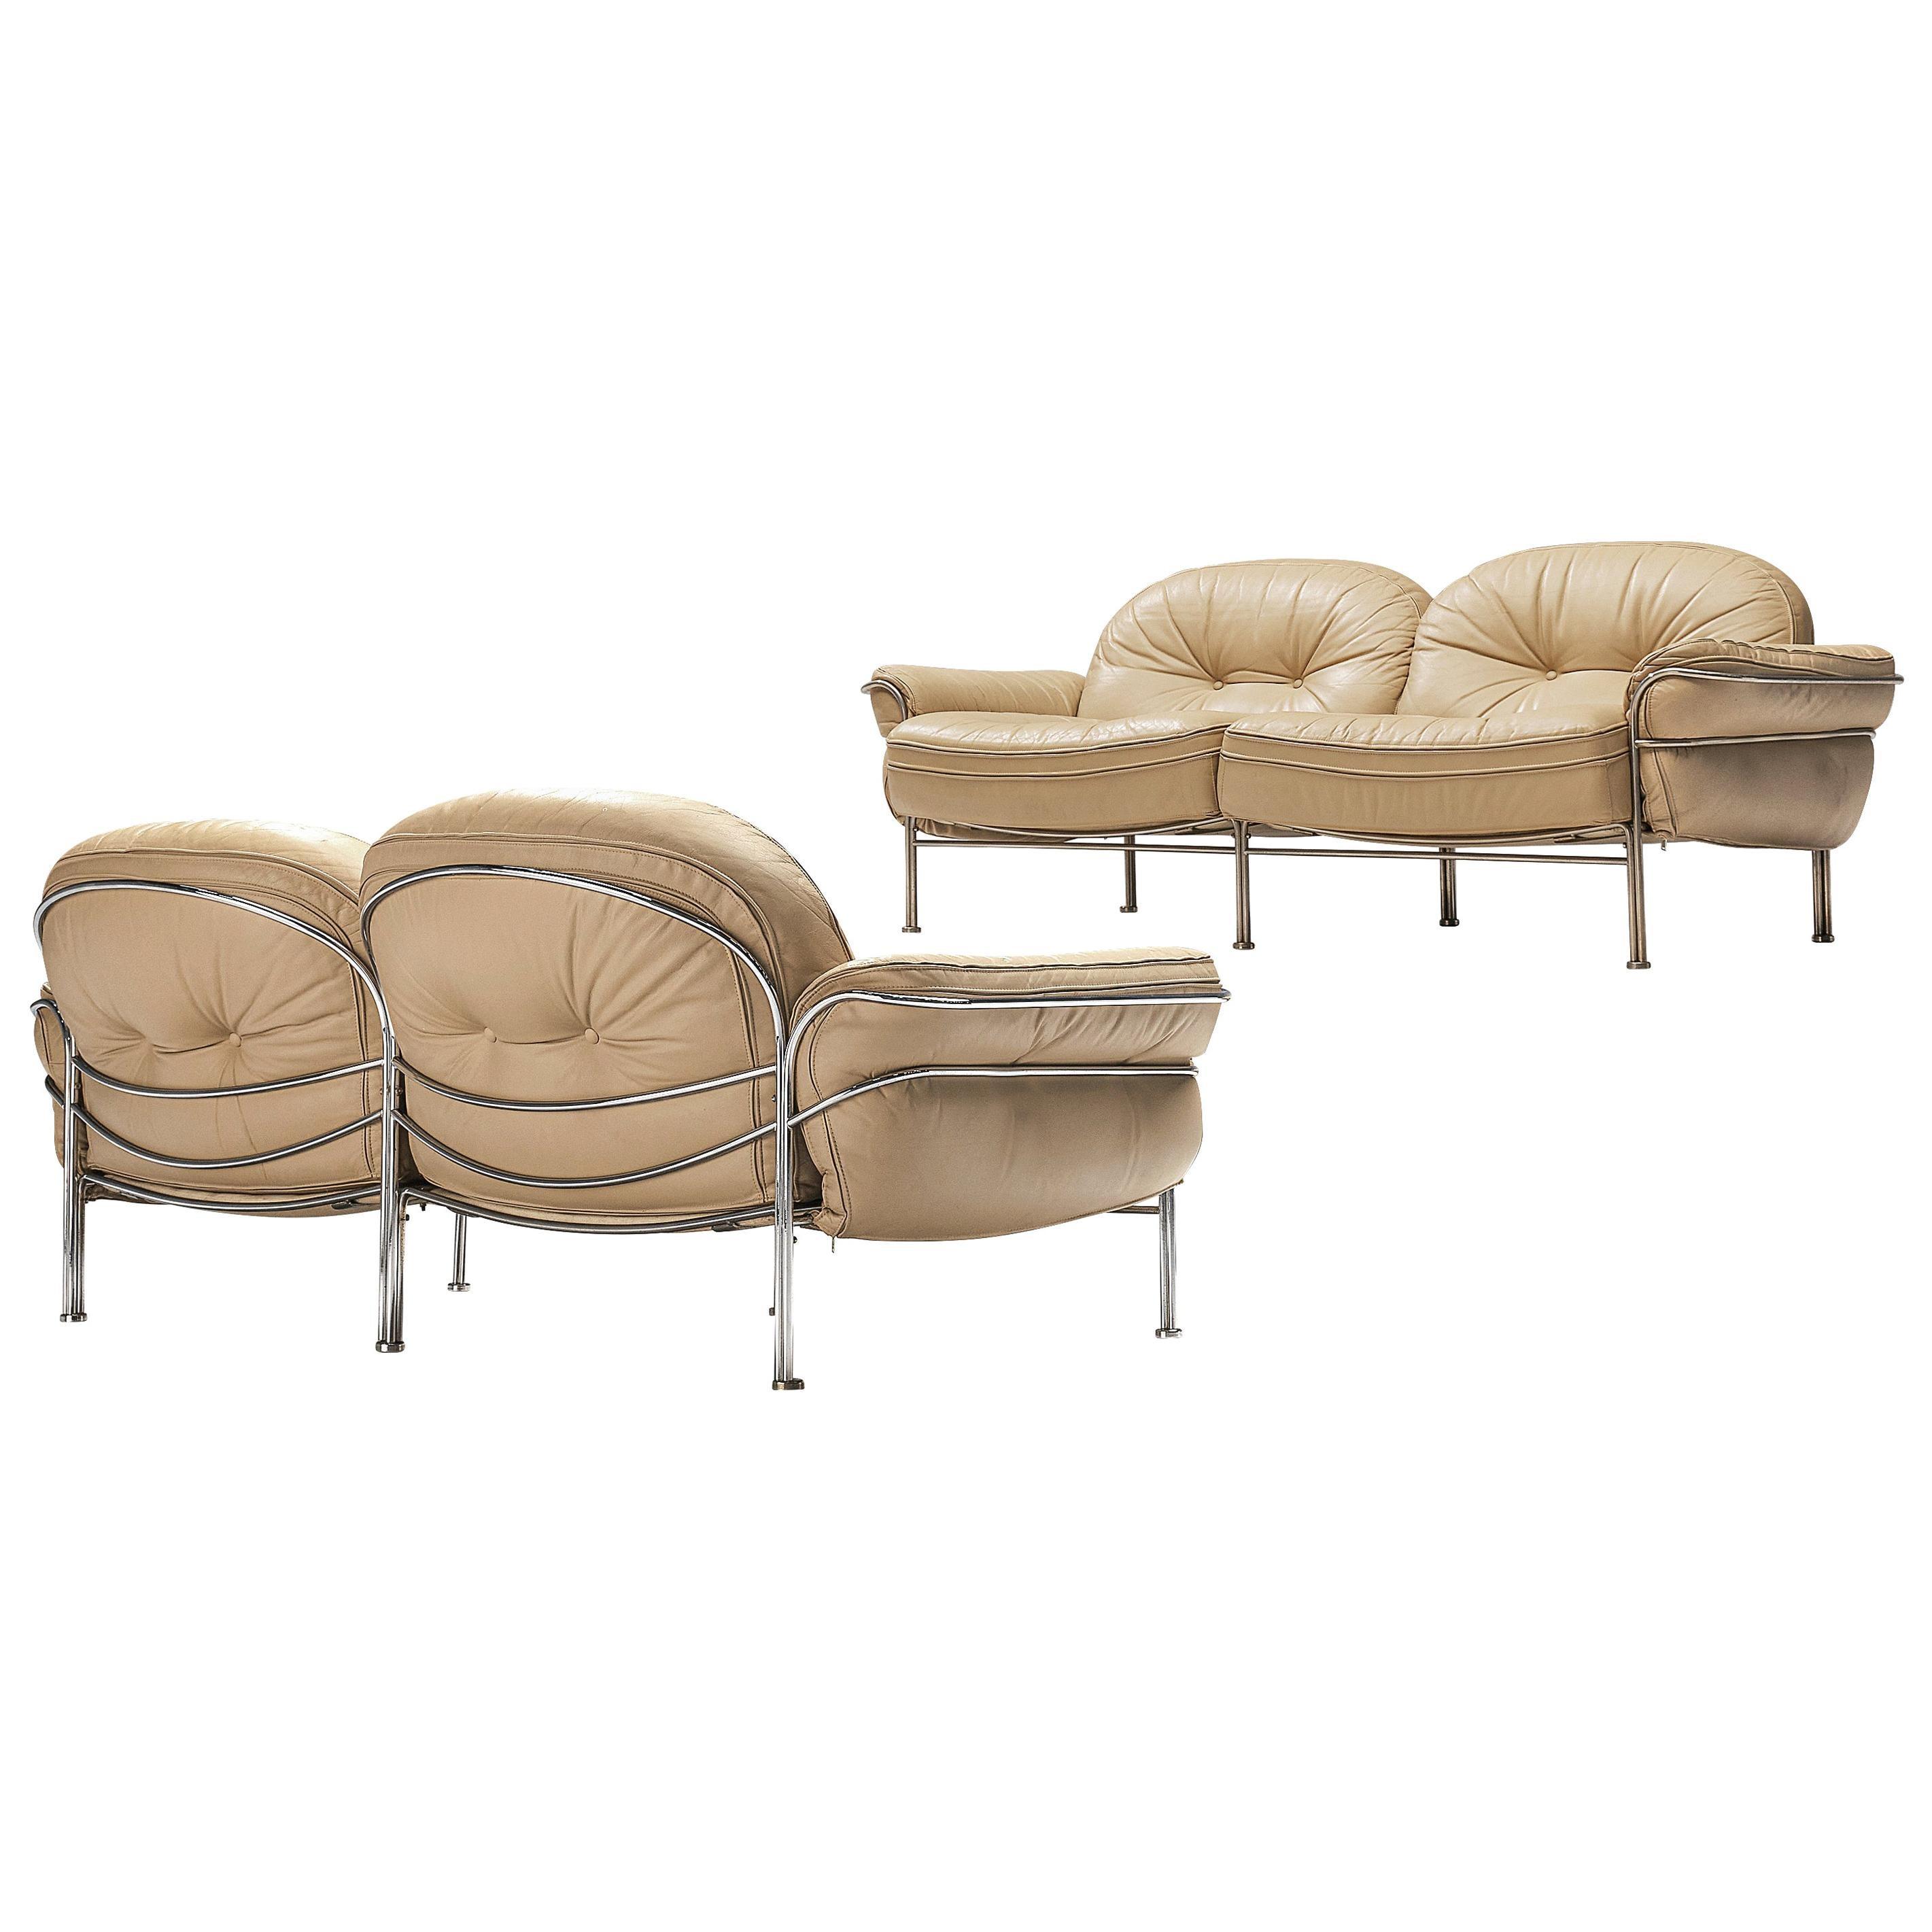 Italian Tubular Two Seat Sofas in Leather